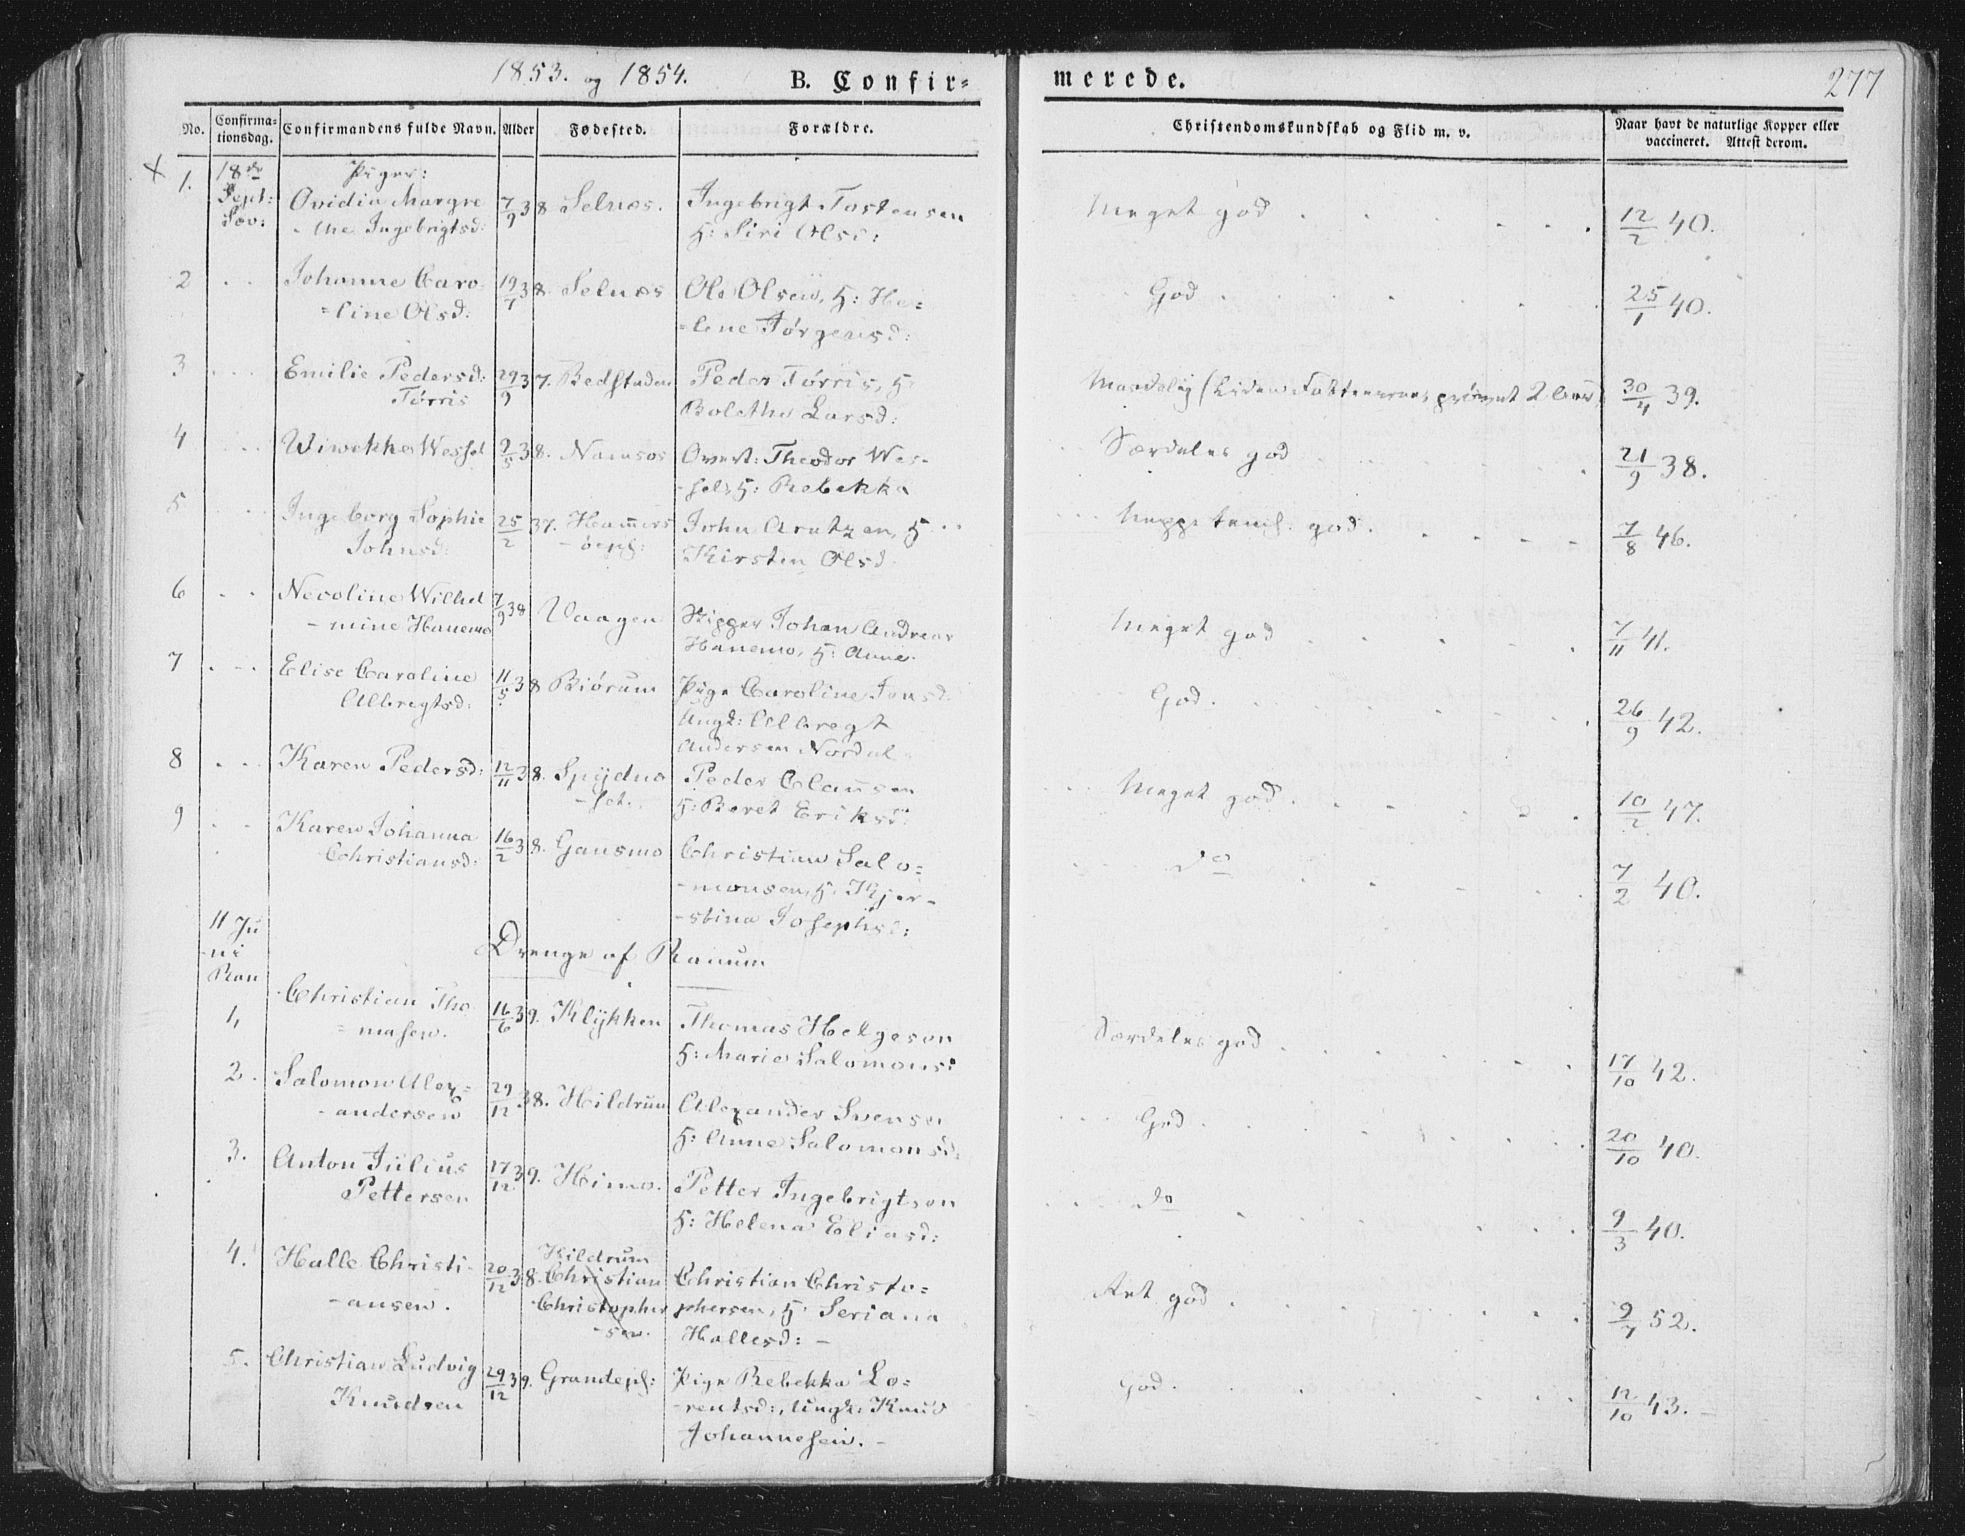 SAT, Ministerialprotokoller, klokkerbøker og fødselsregistre - Nord-Trøndelag, 764/L0551: Ministerialbok nr. 764A07a, 1824-1864, s. 277